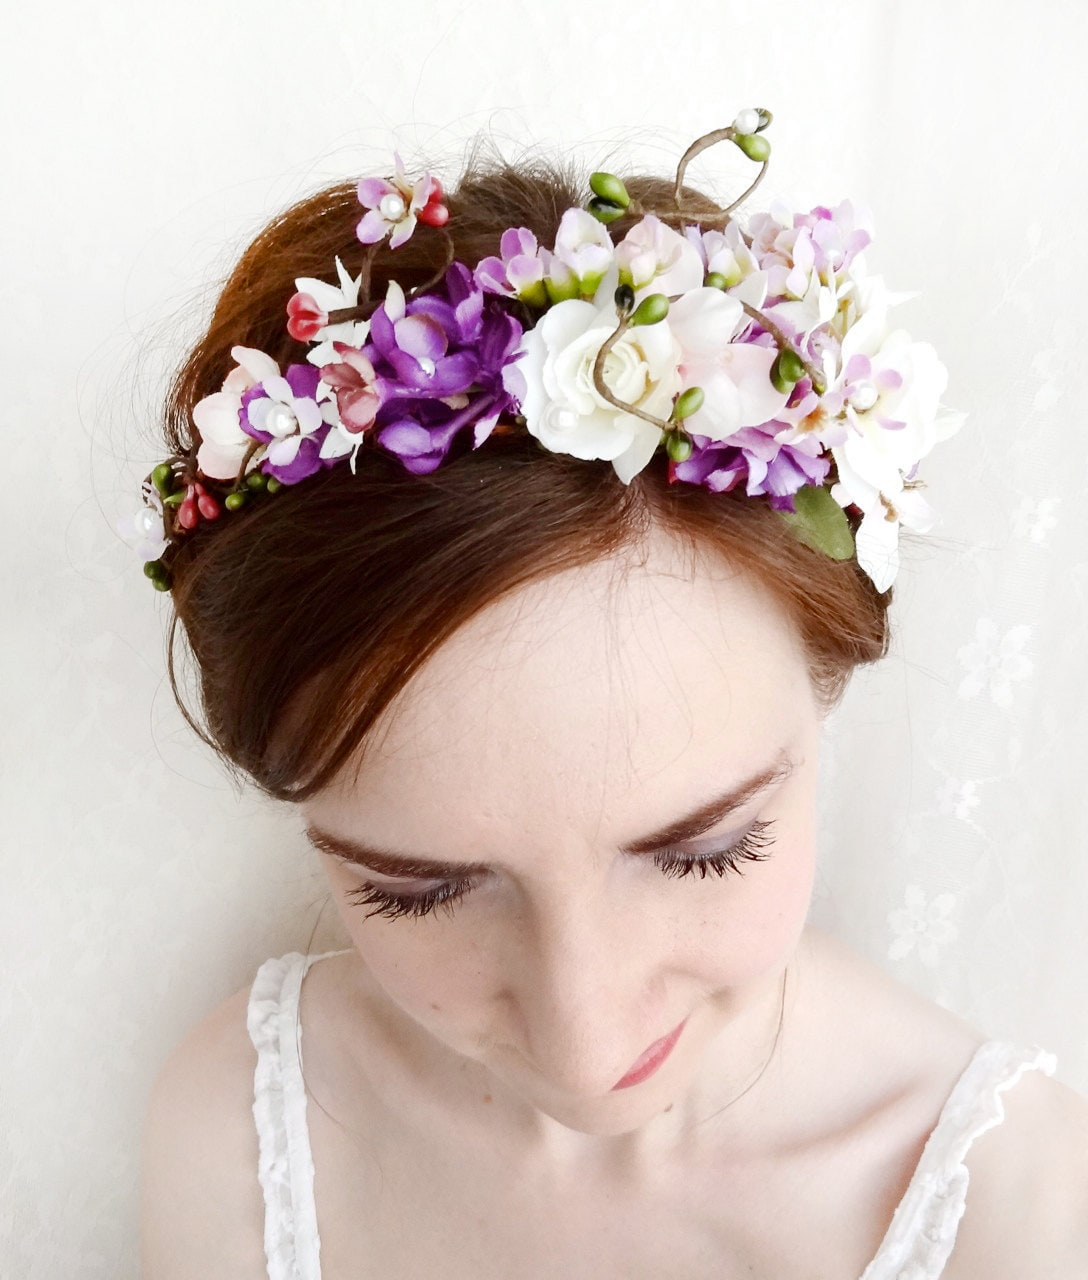 Flower Wreaths For Weddings